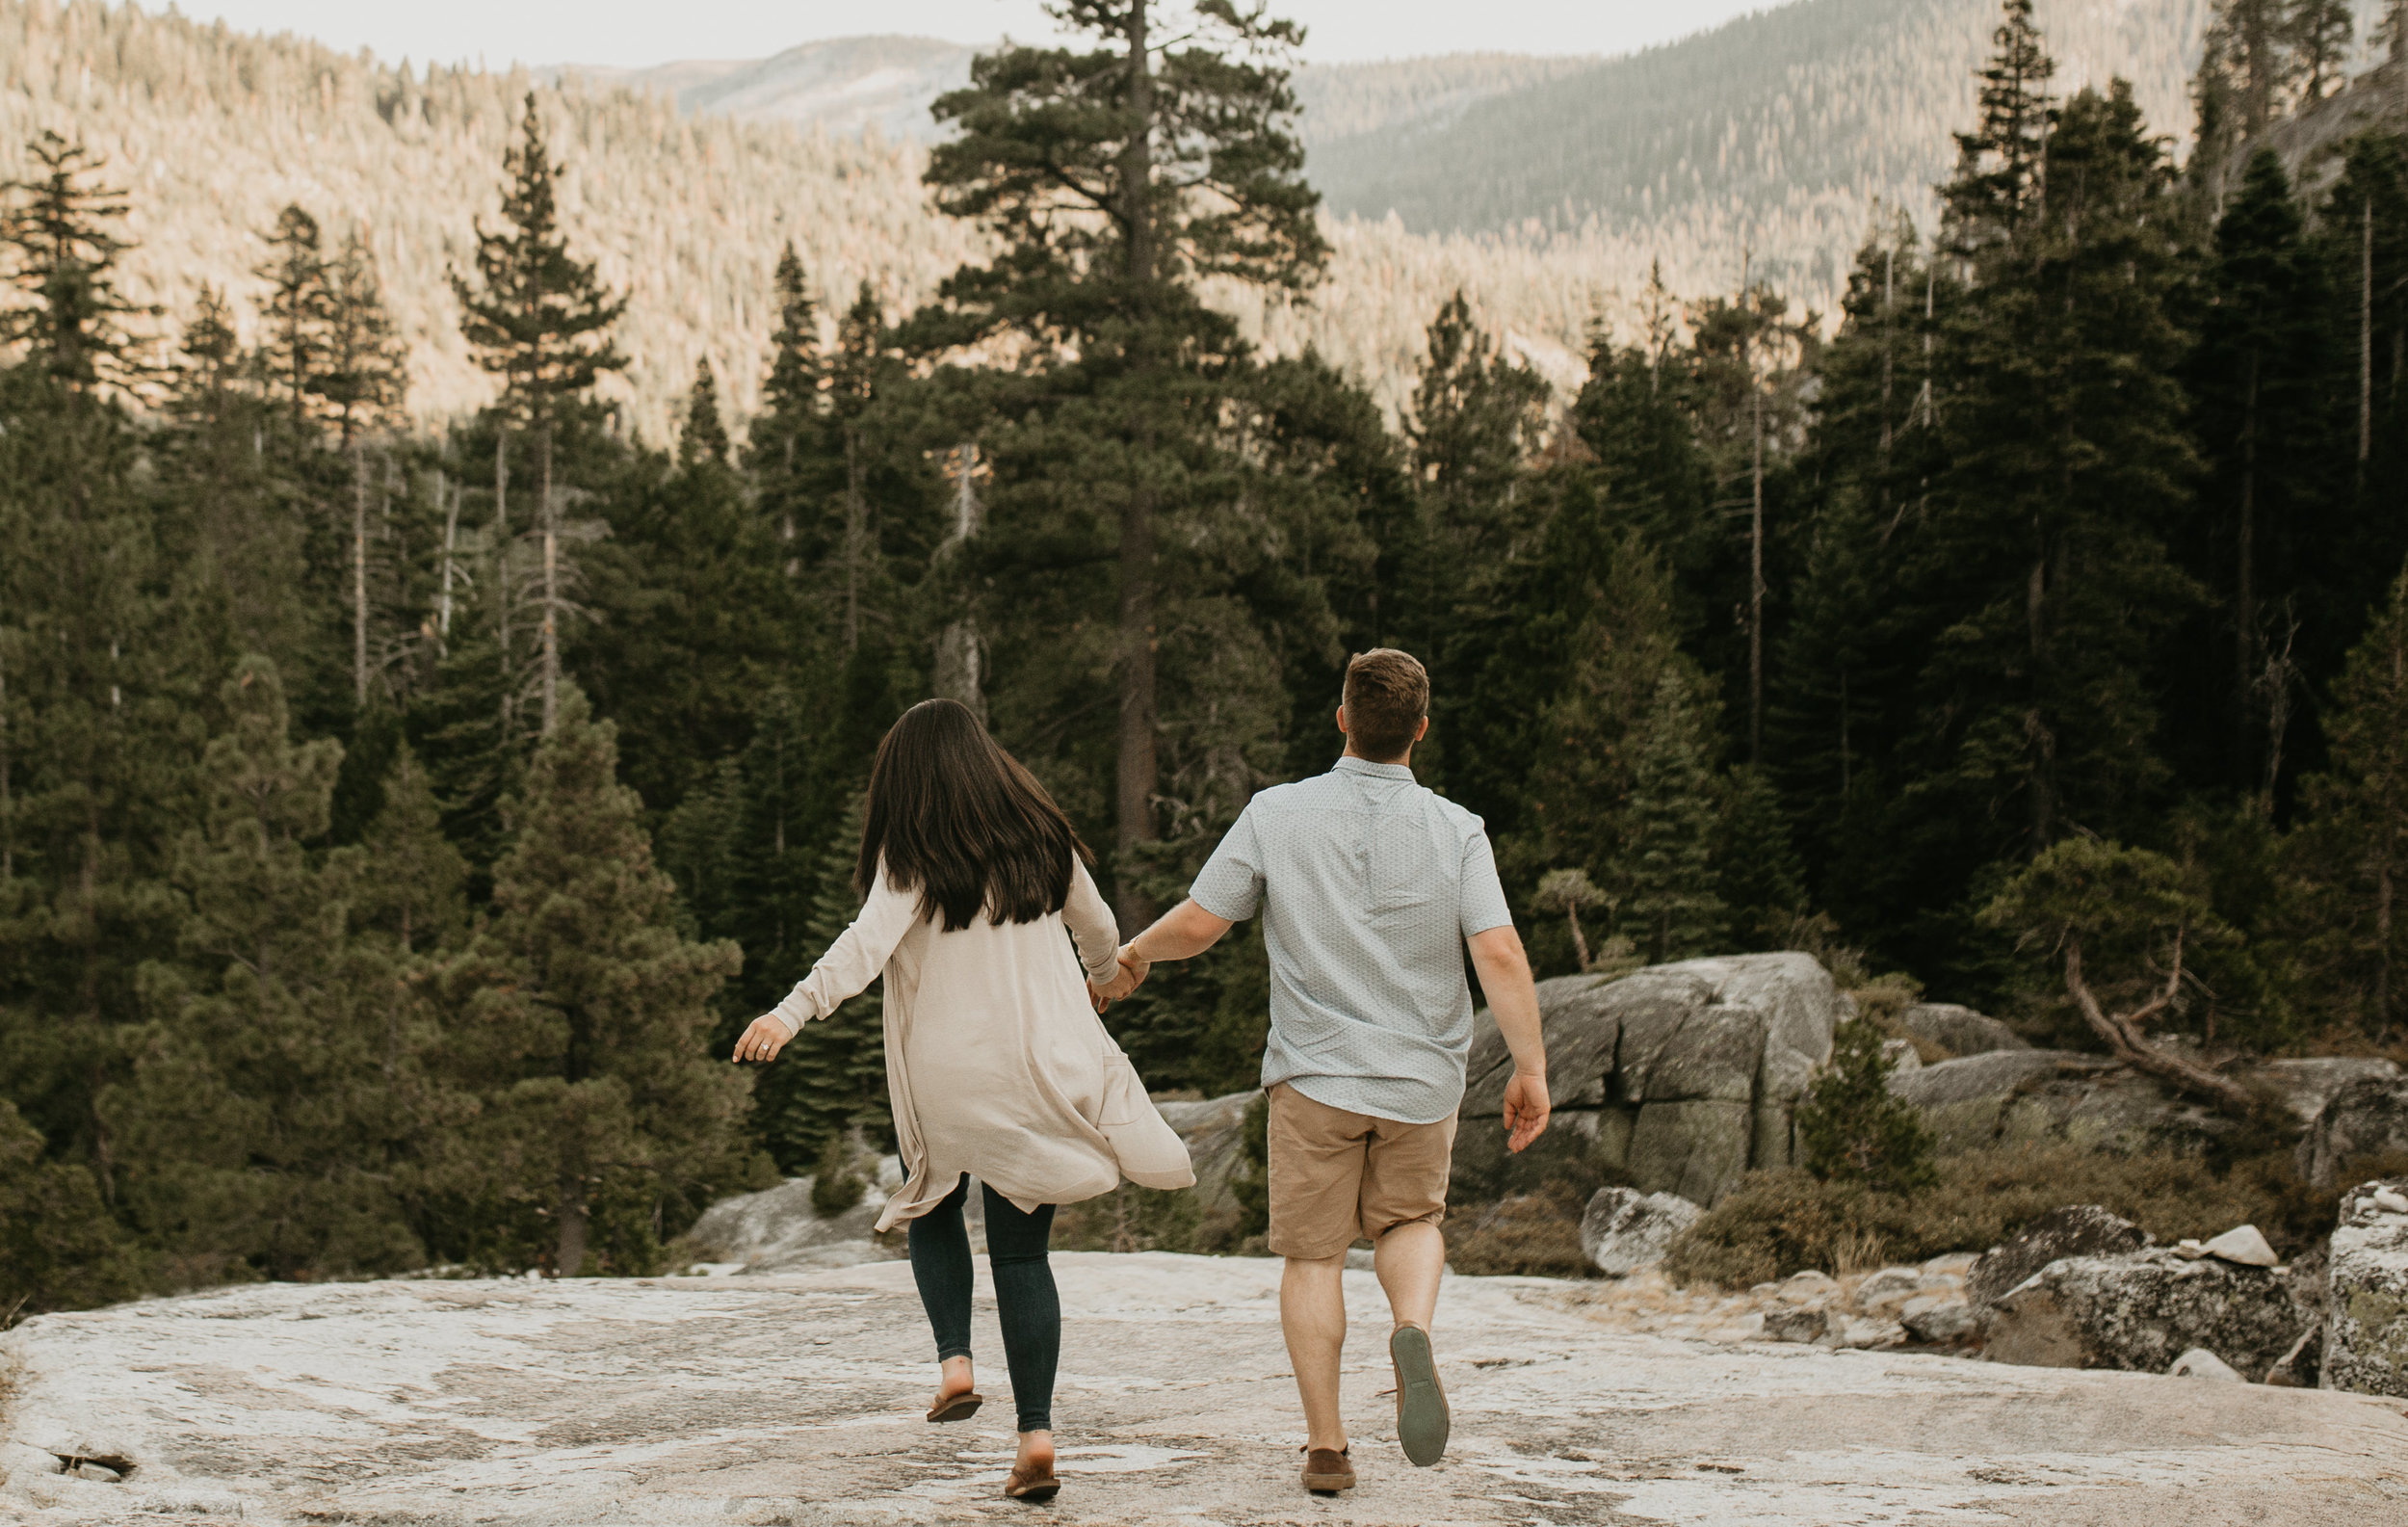 nicole-daacke-photography-fun-adventure-session-waterfall-lake-tahoe-sunset-destination-wedding-photographer-northern-california-elopement-photographer-5.jpg